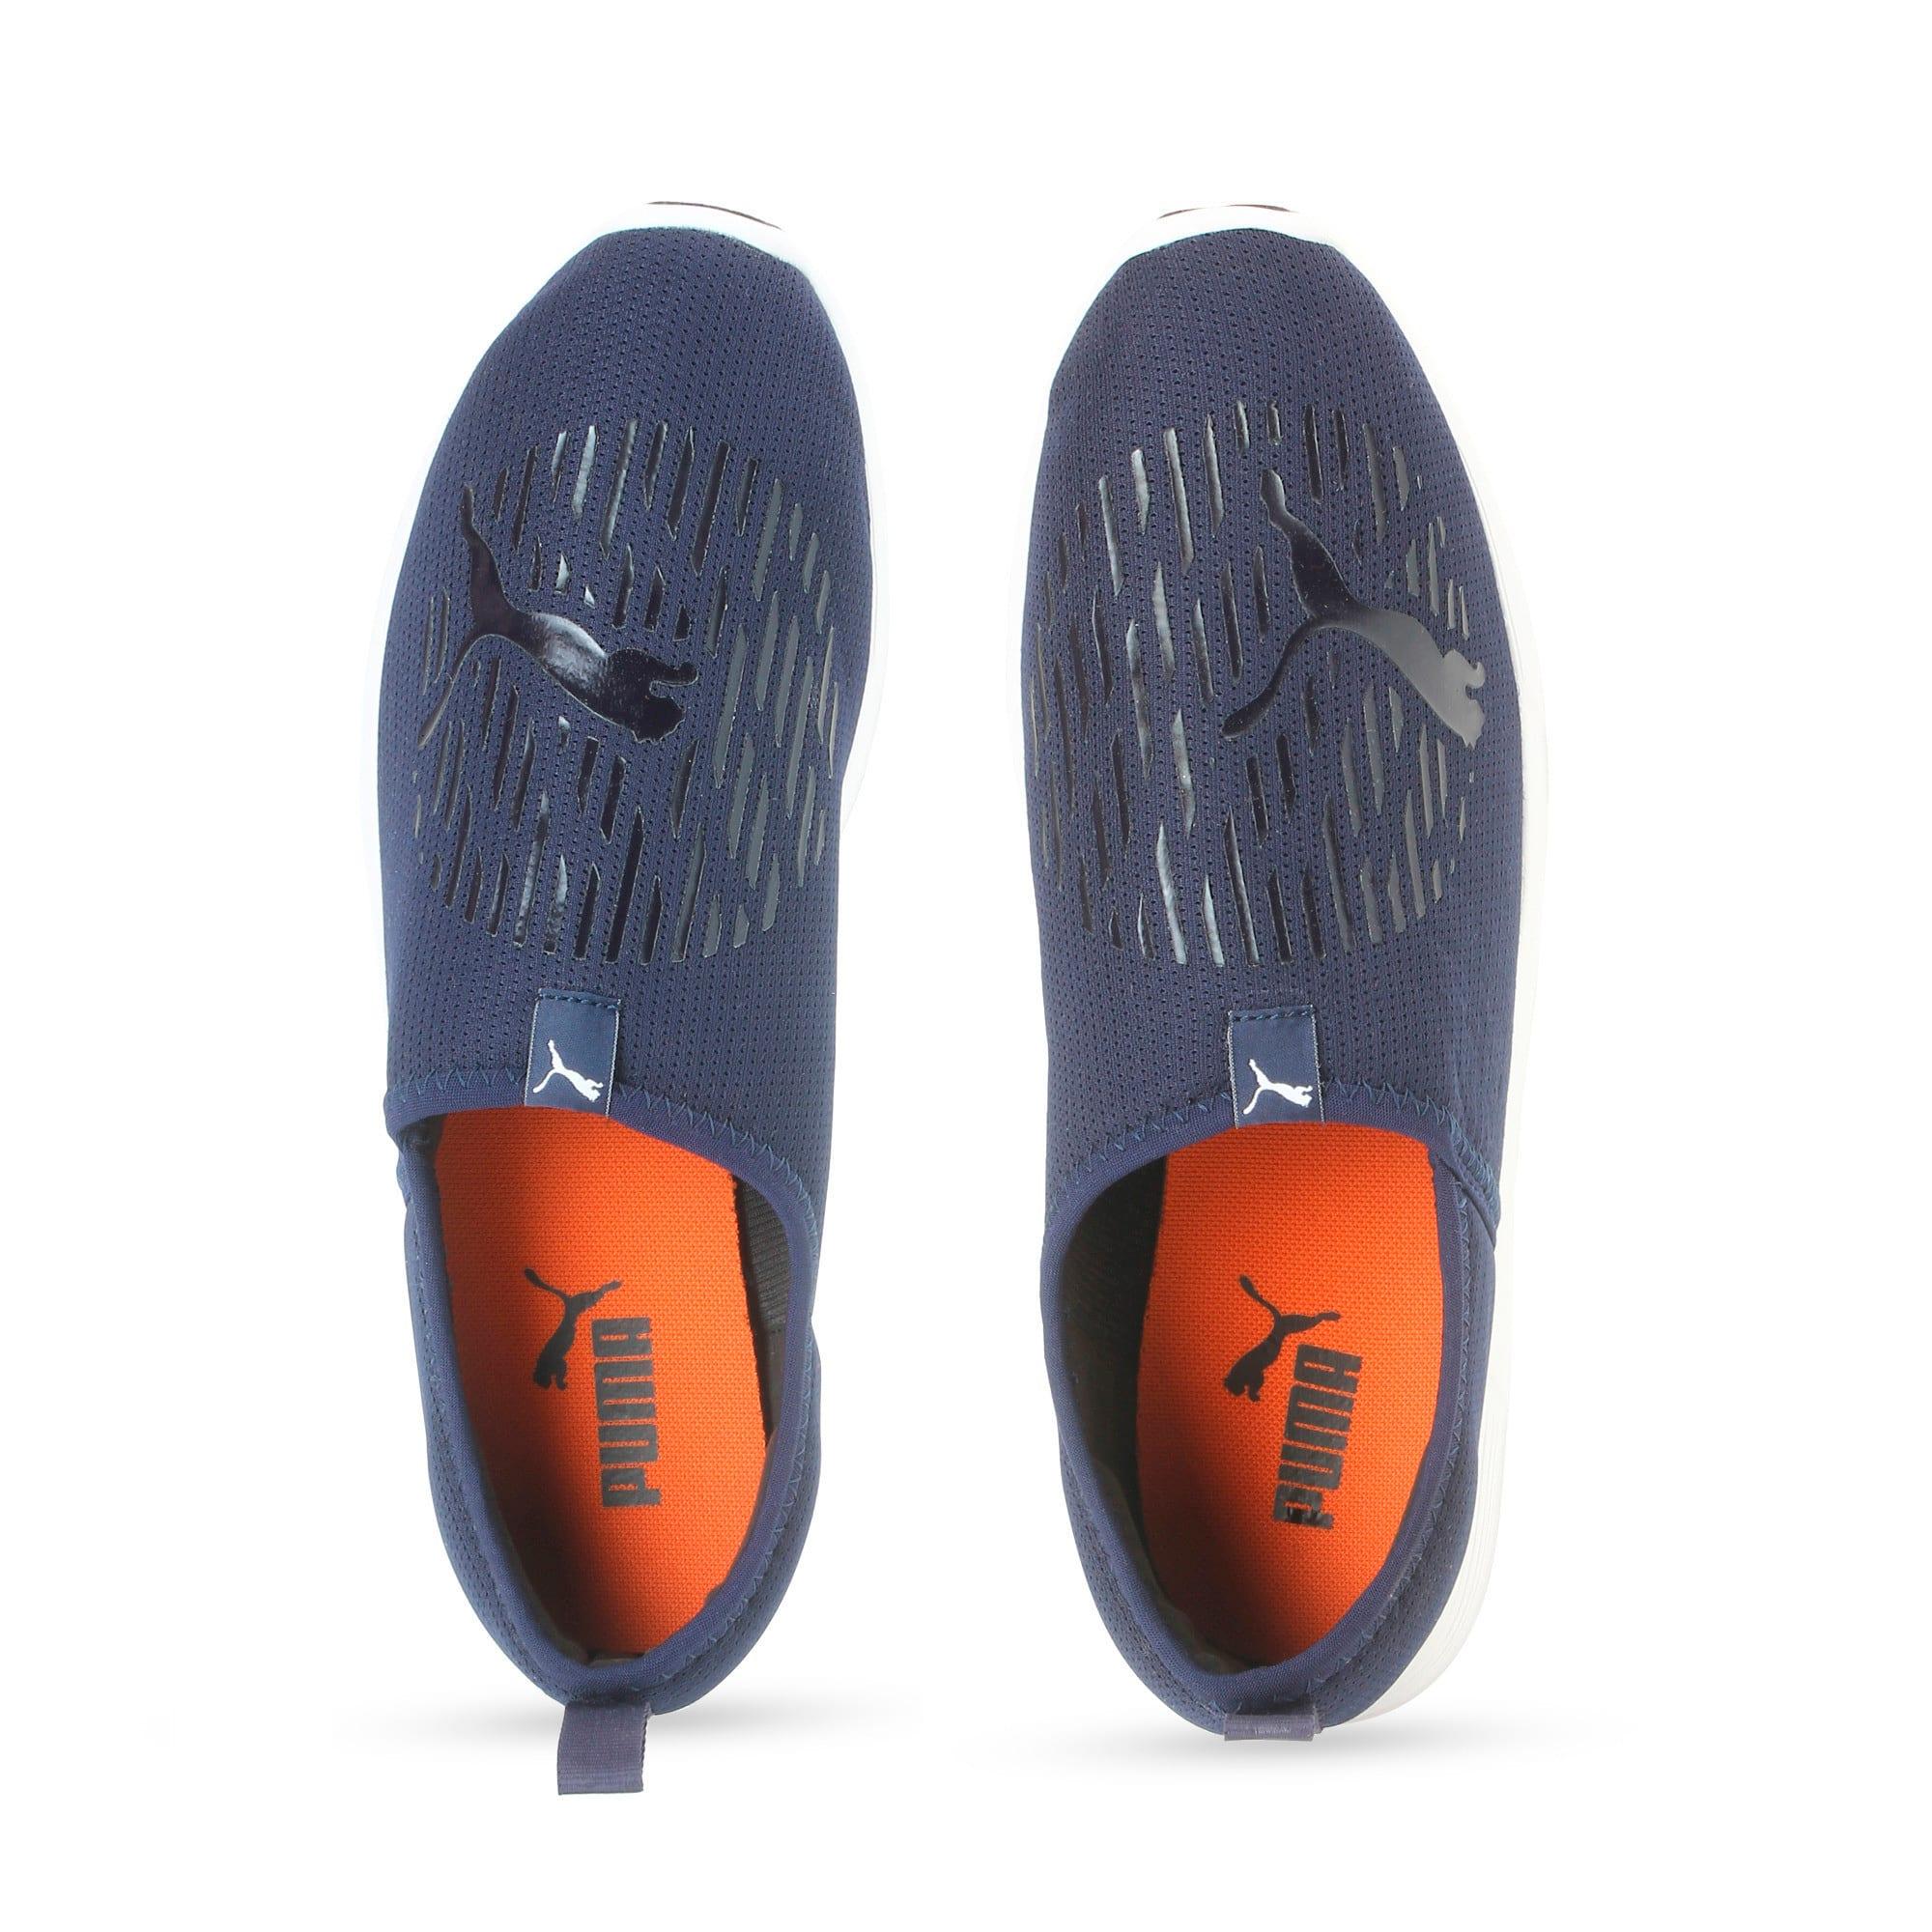 Thumbnail 6 of ST Comfort IDP Men's Sportstyle Shoes, Peacoat-Puma White, medium-IND